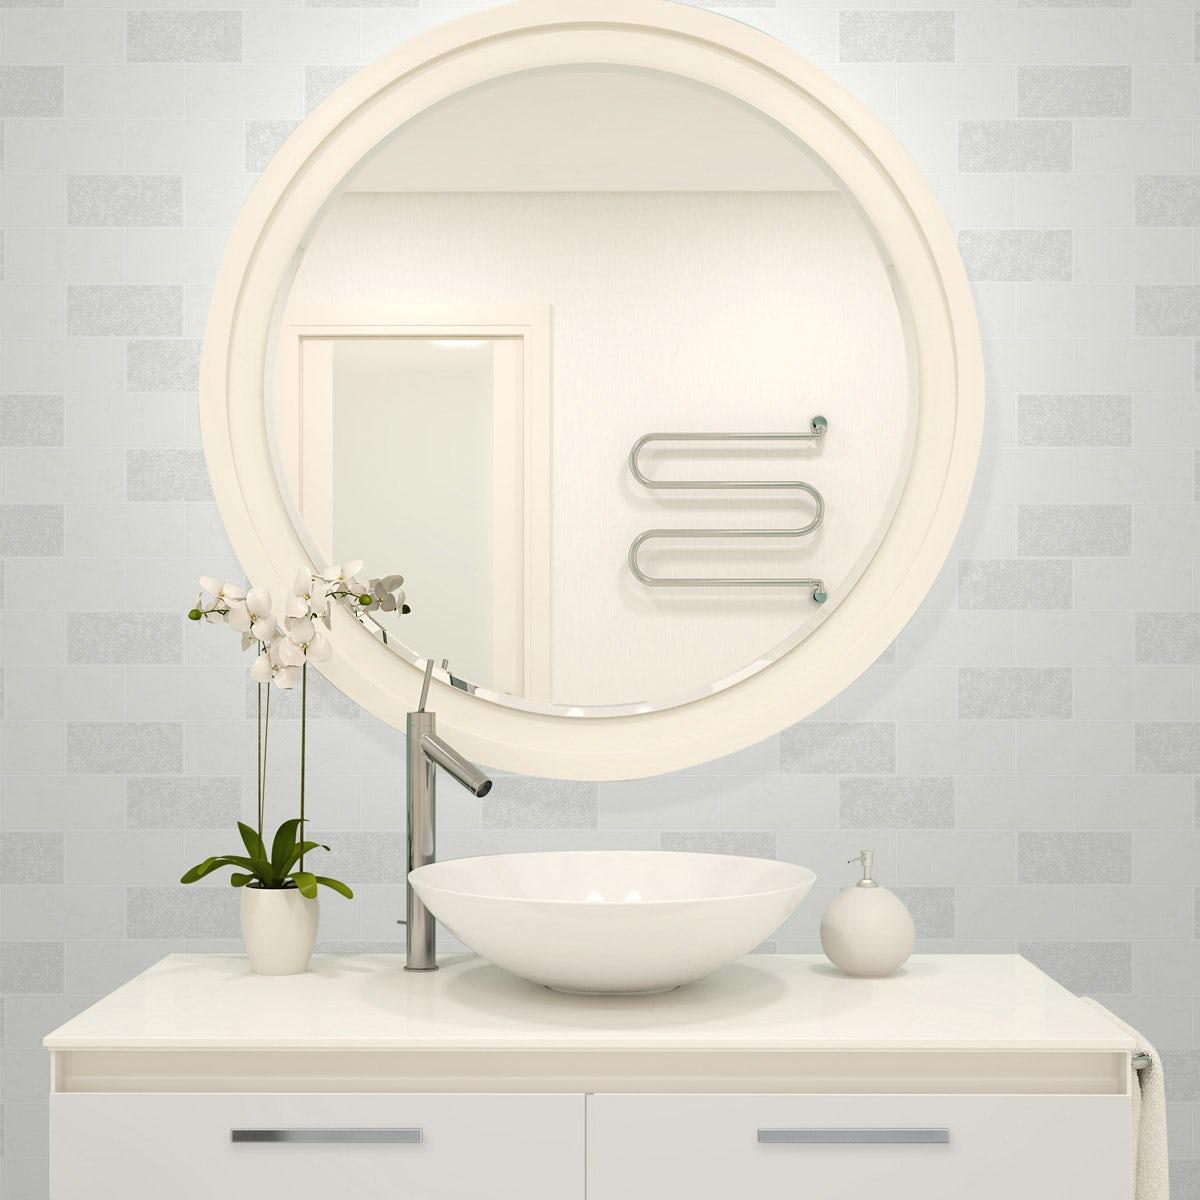 Bathroom Tile Wallpaper Bathroom And Kitchen Wallpaper Victoriaplumcom